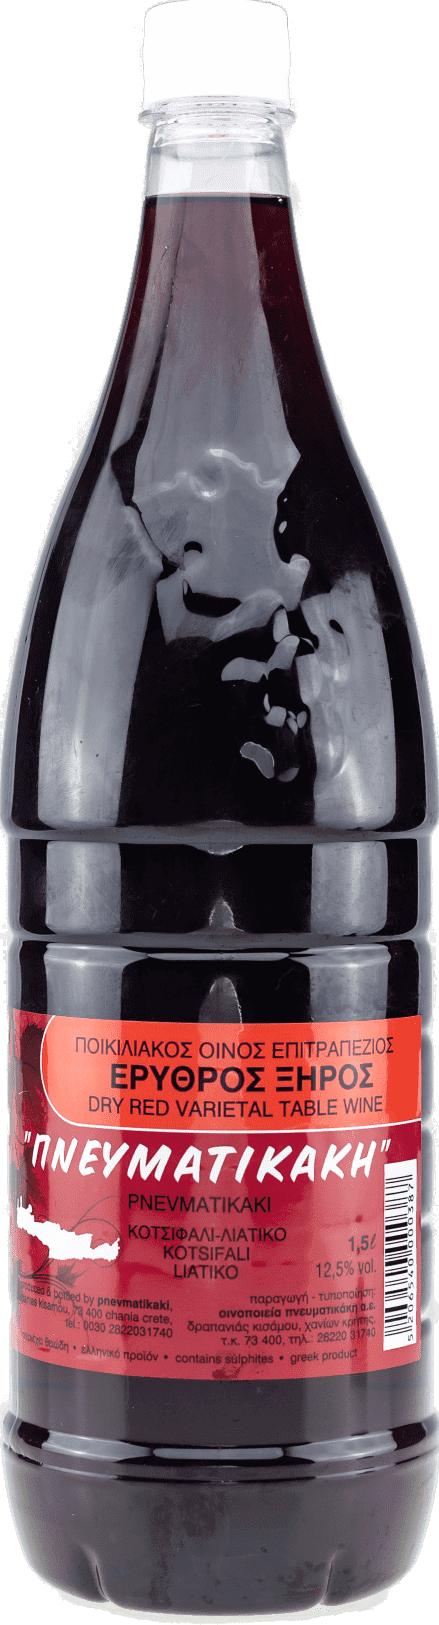 pneym-bottle-44 (1)